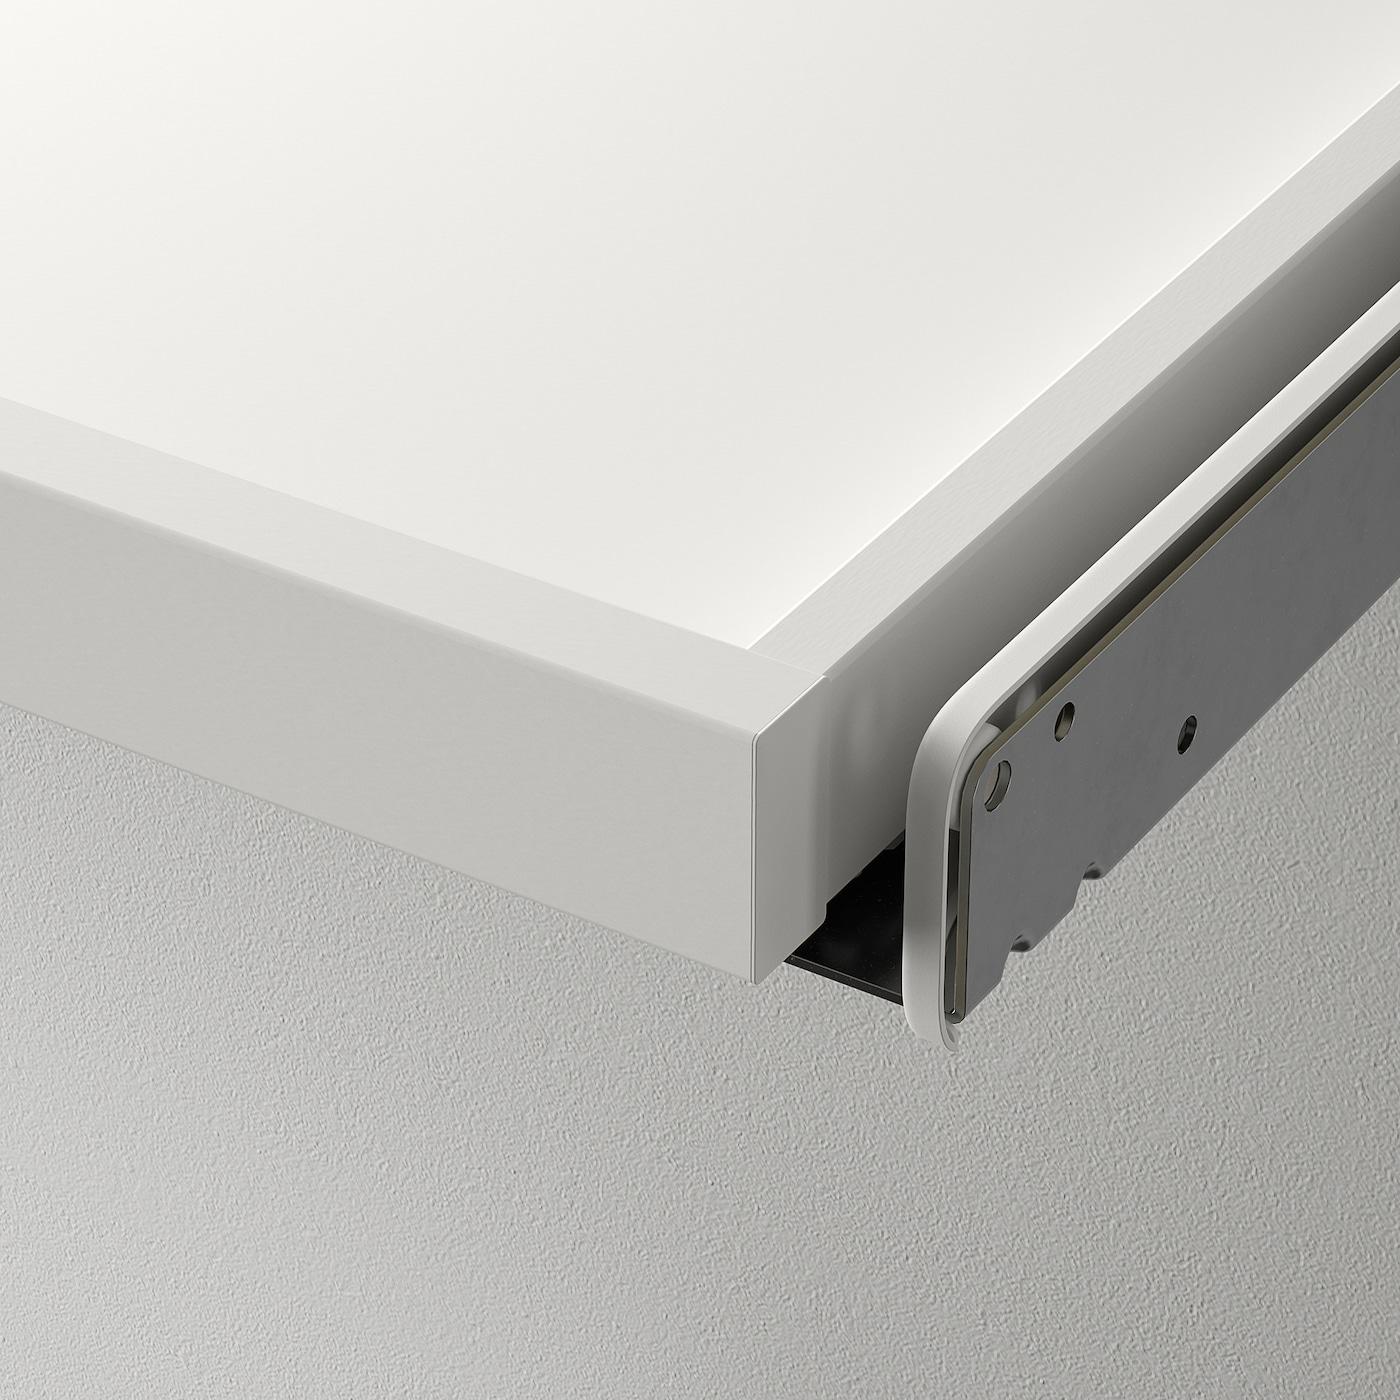 KOMPLEMENT Utdragbart hyllplan med insats, vit, 100x58 cm